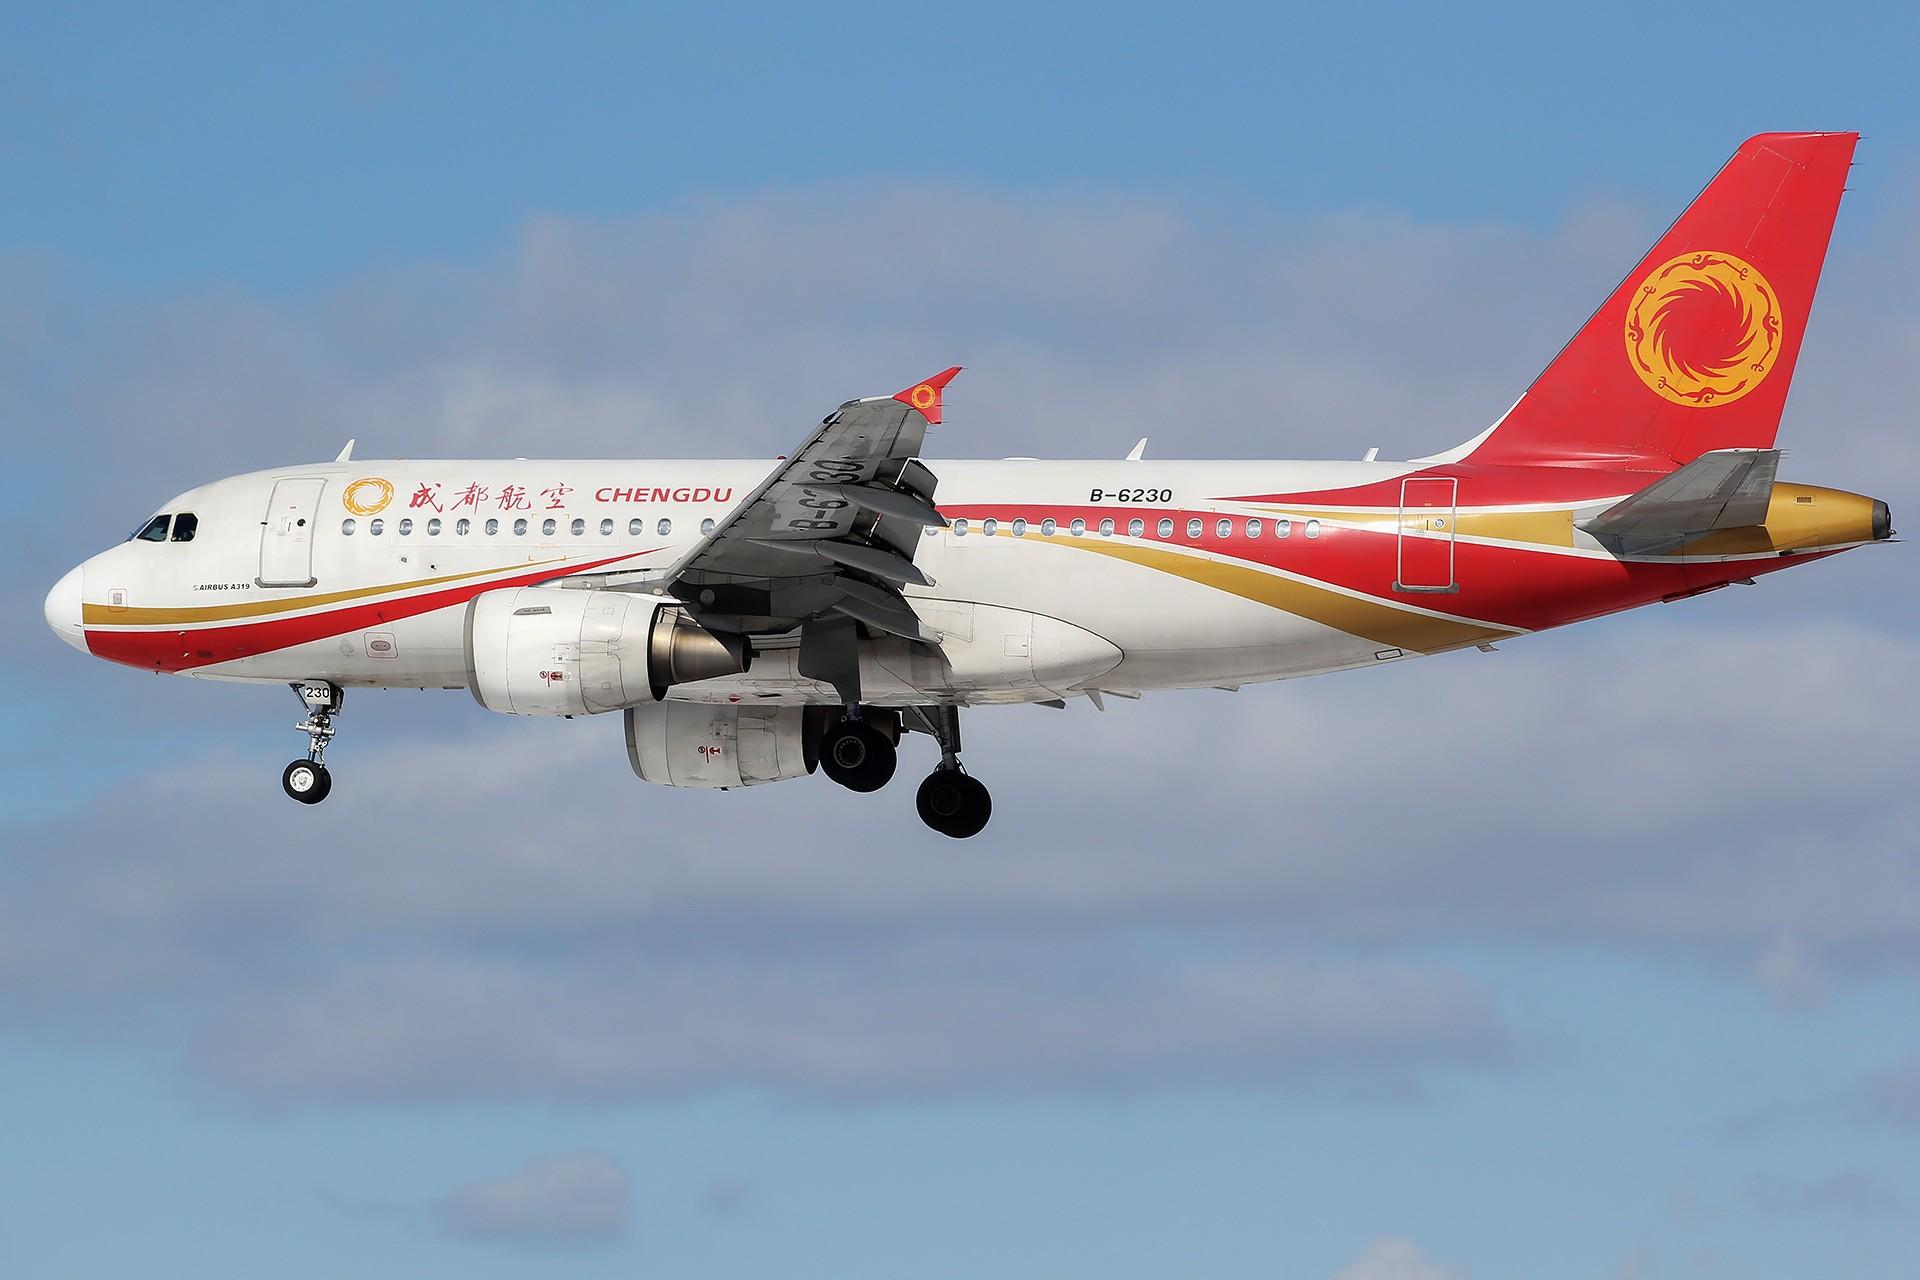 Re:[原创][原创][DLC]。。。DLC雪。。。 AIRBUS A319-100 B-6230 中国大连国际机场